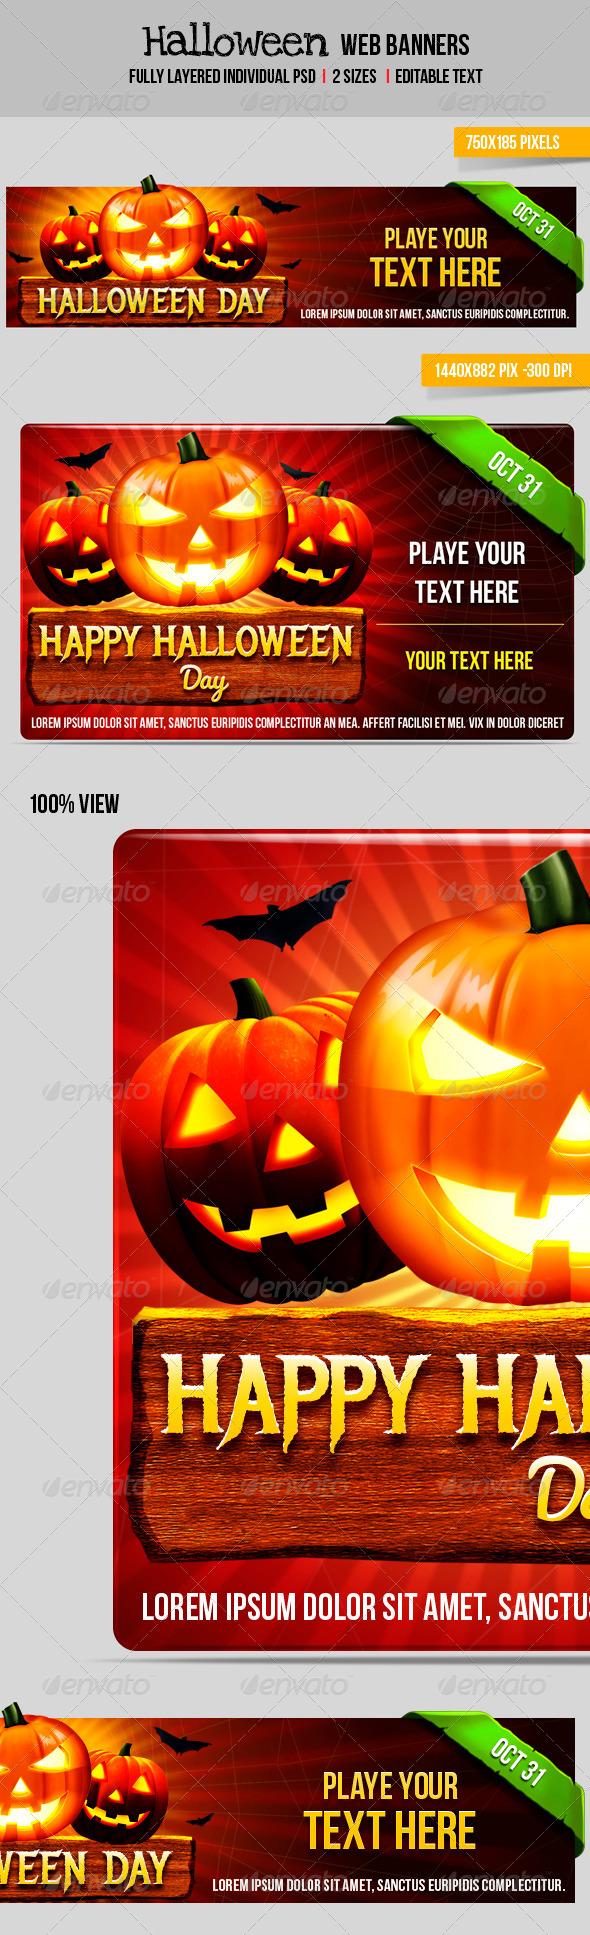 GraphicRiver Halloween Web Banner 5496282